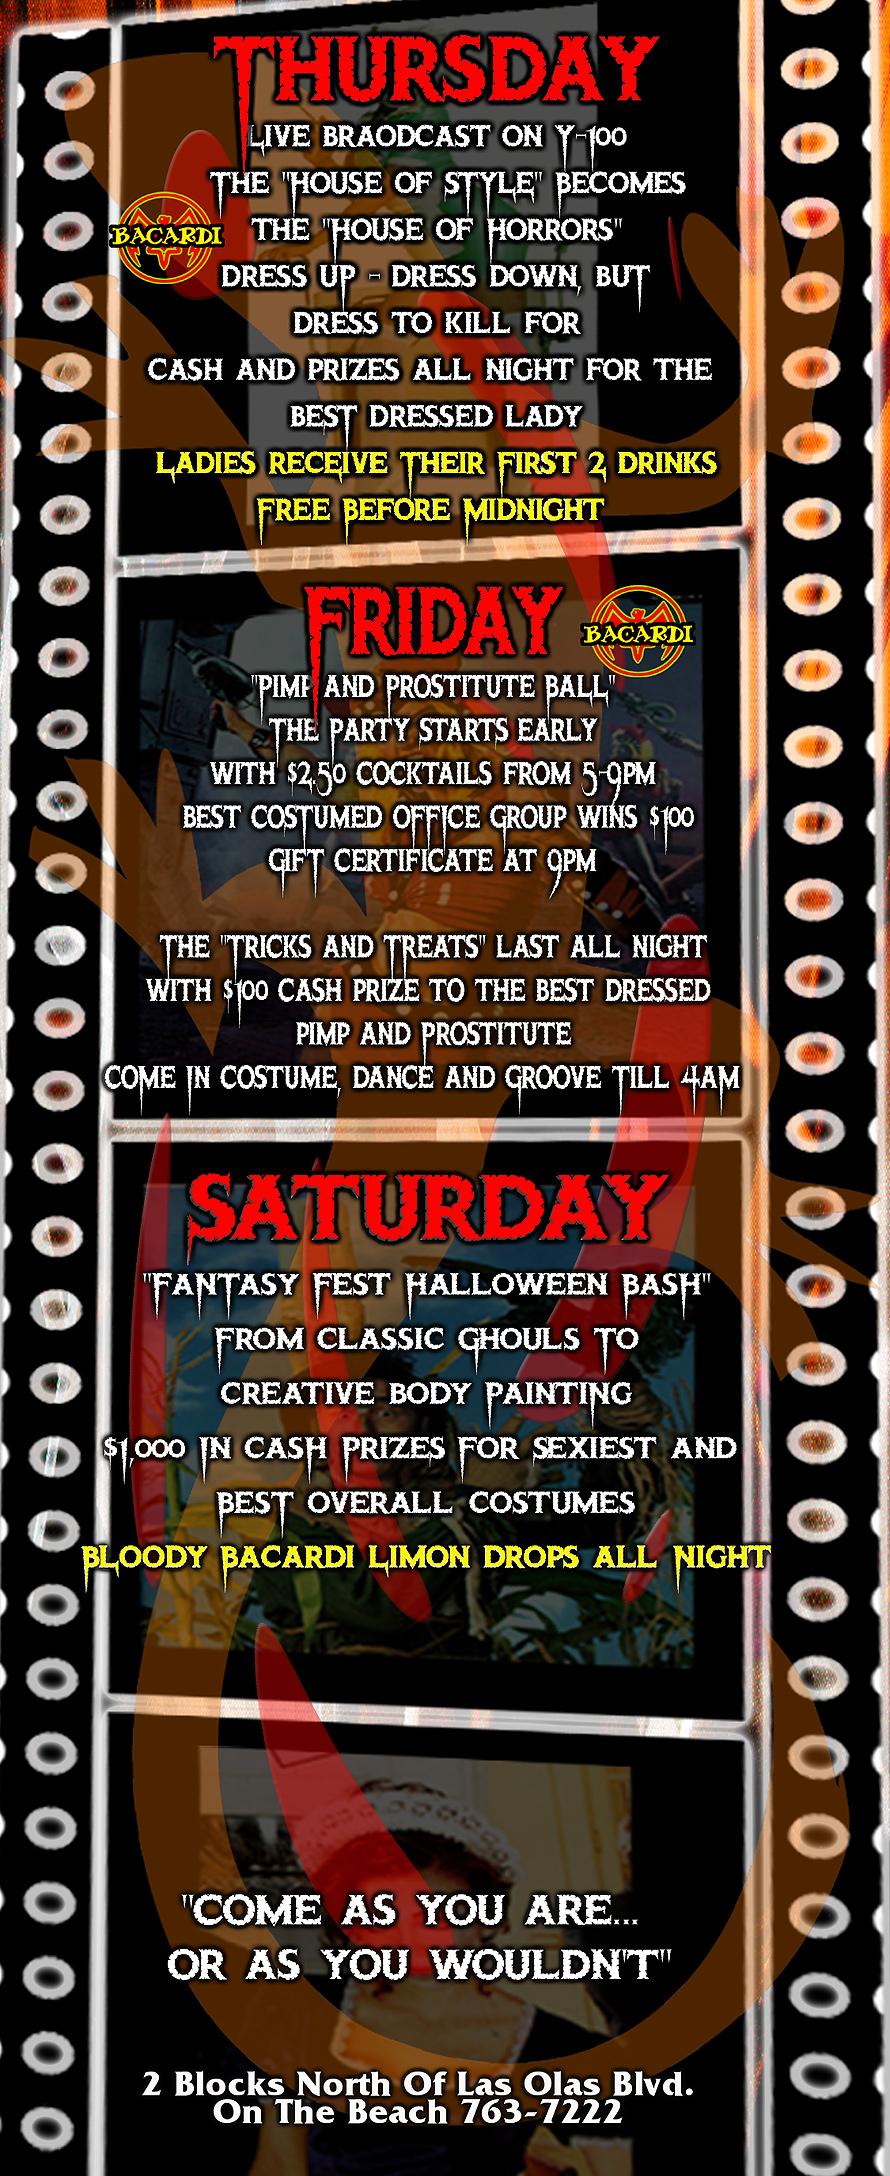 Cafe Iguana Presents Halloween Fantasy Fest